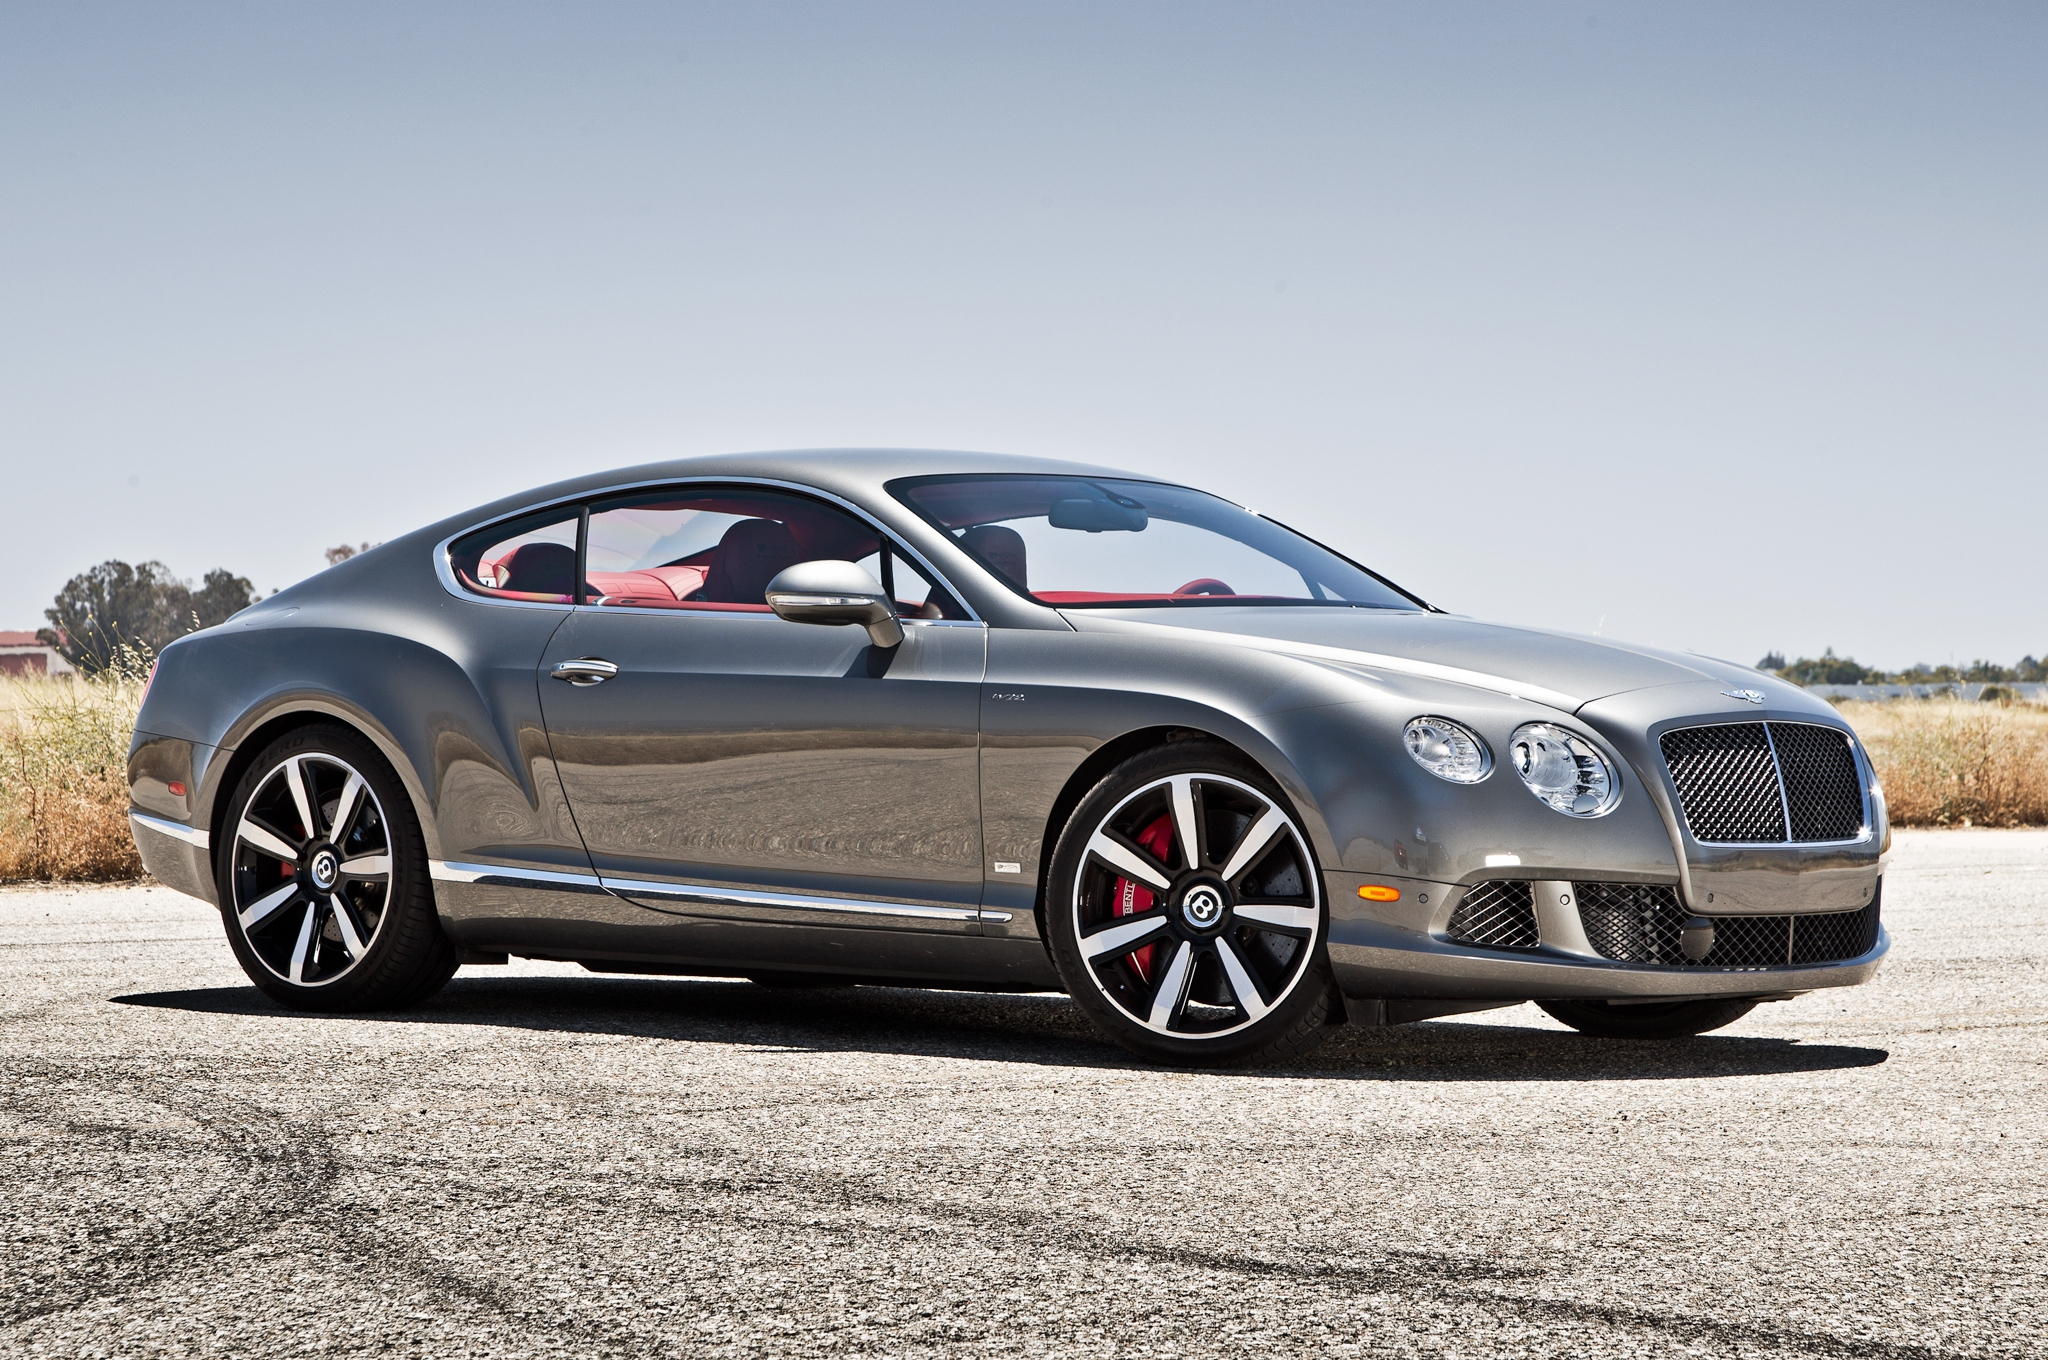 Bentley Continental Gt Images